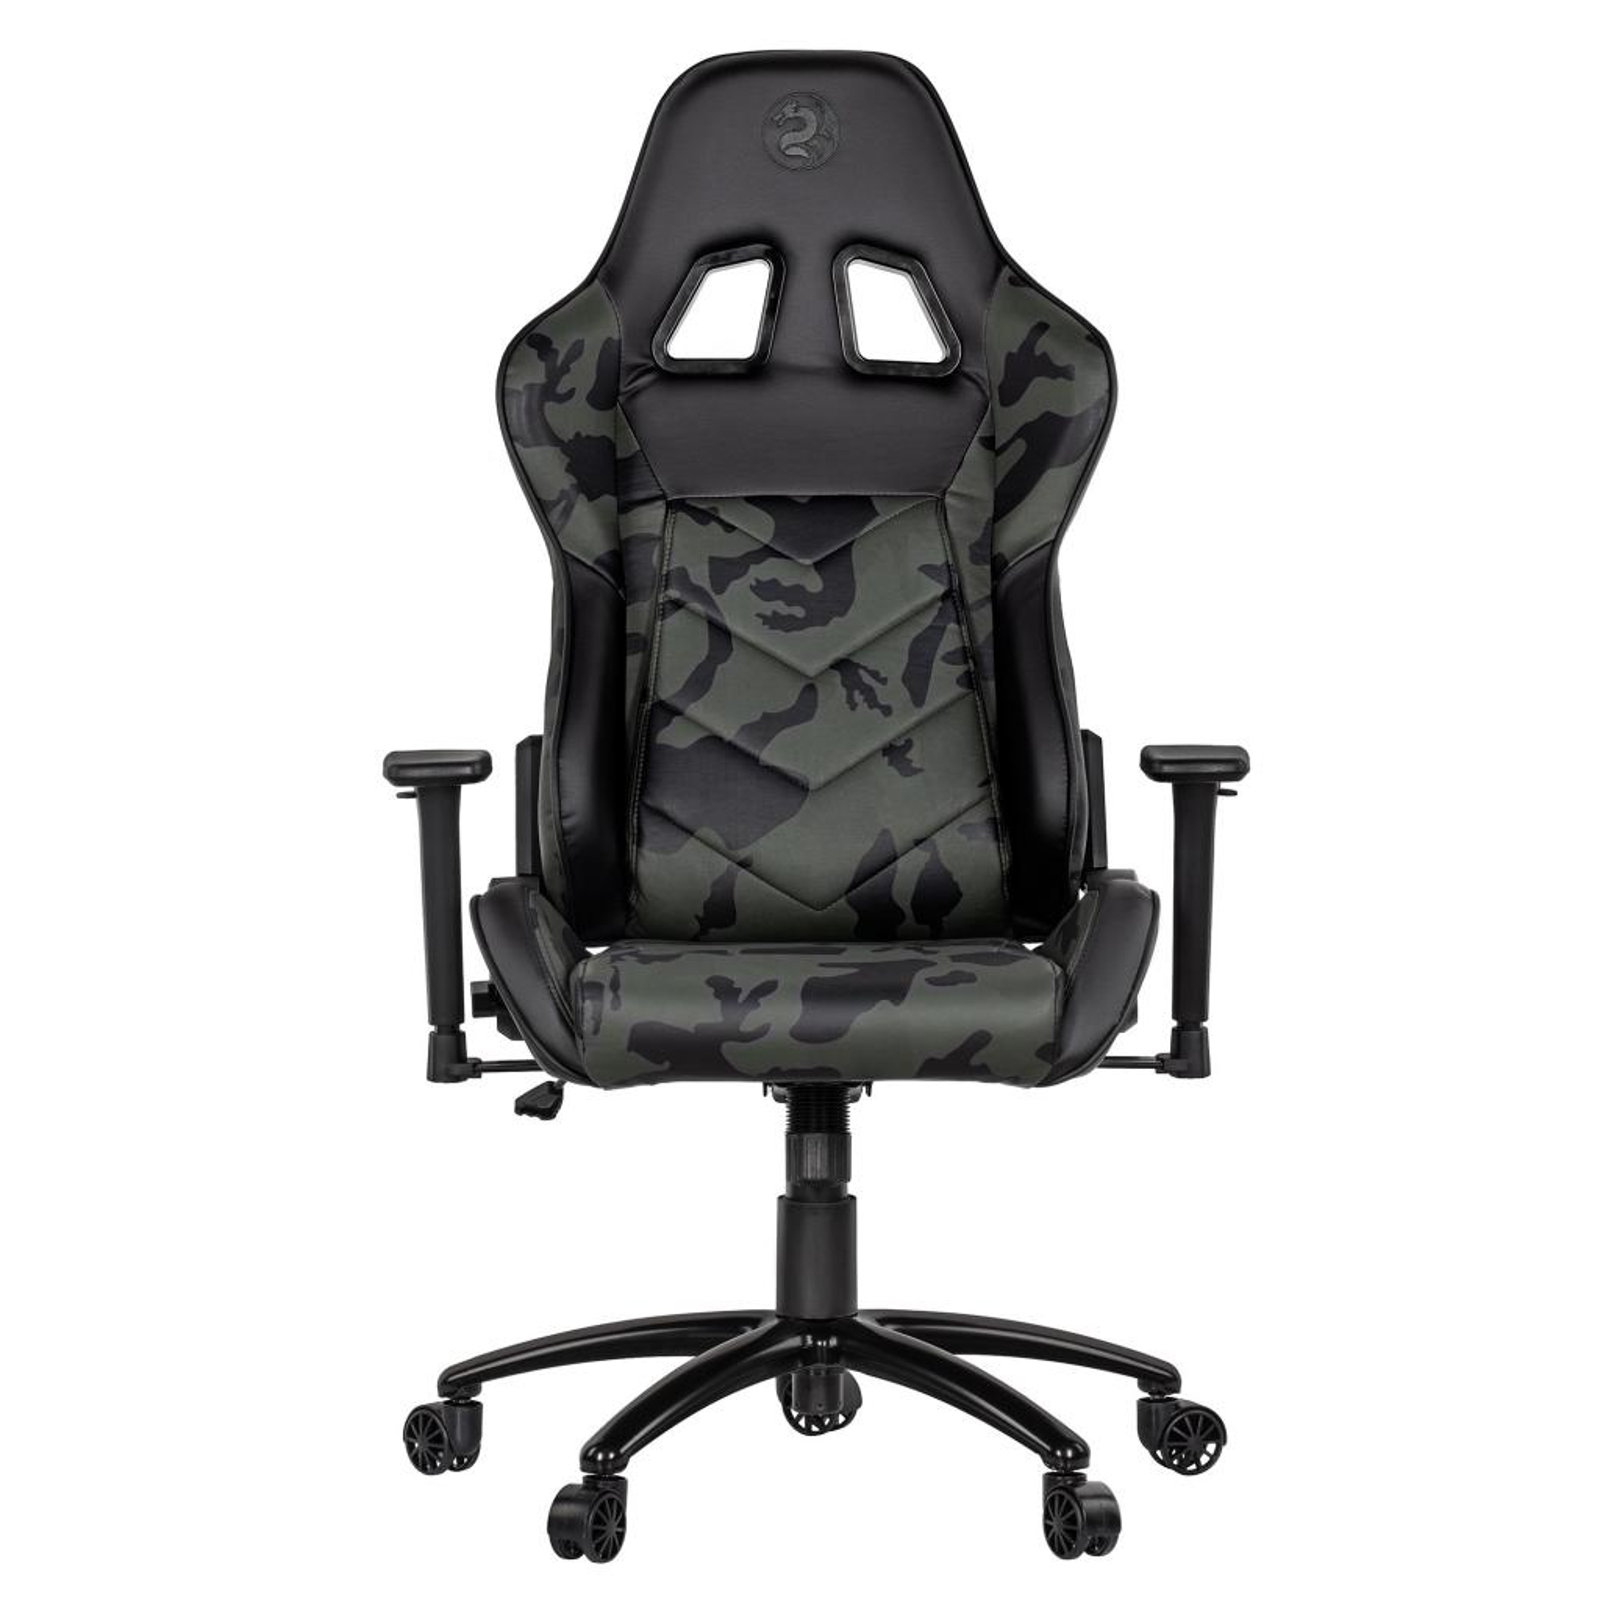 Крісло ігрове 2E GC22 Camouflage (2E-GC22CAM) зображення 3